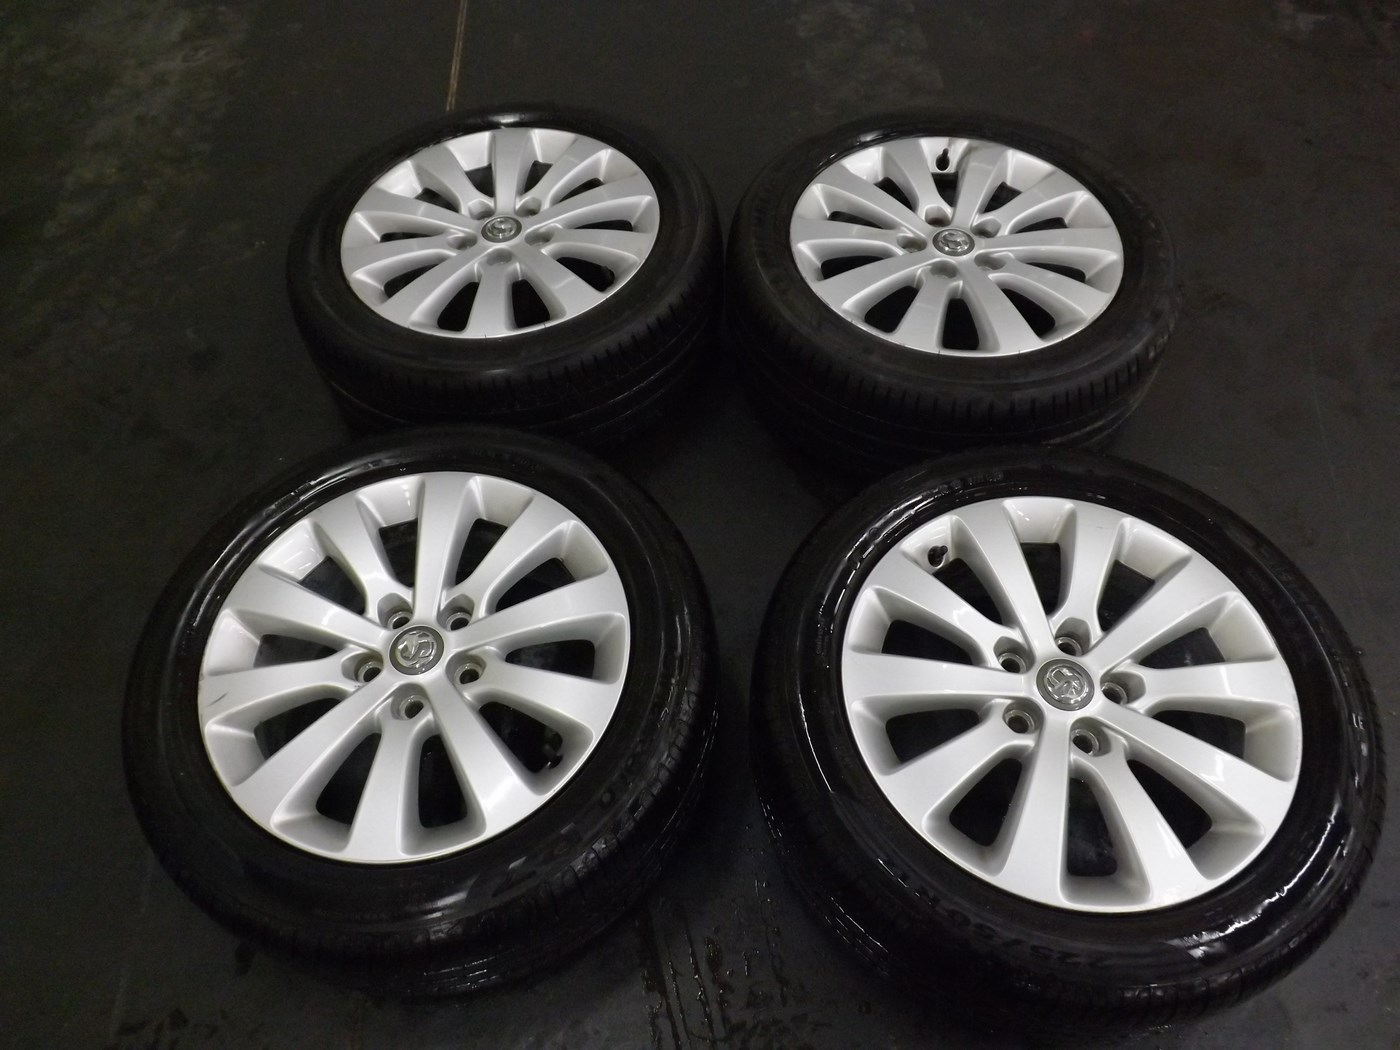 Opel Astra J Iv 4 Felgi Aluminiowe 17 5x115 7086460630 Oficjalne